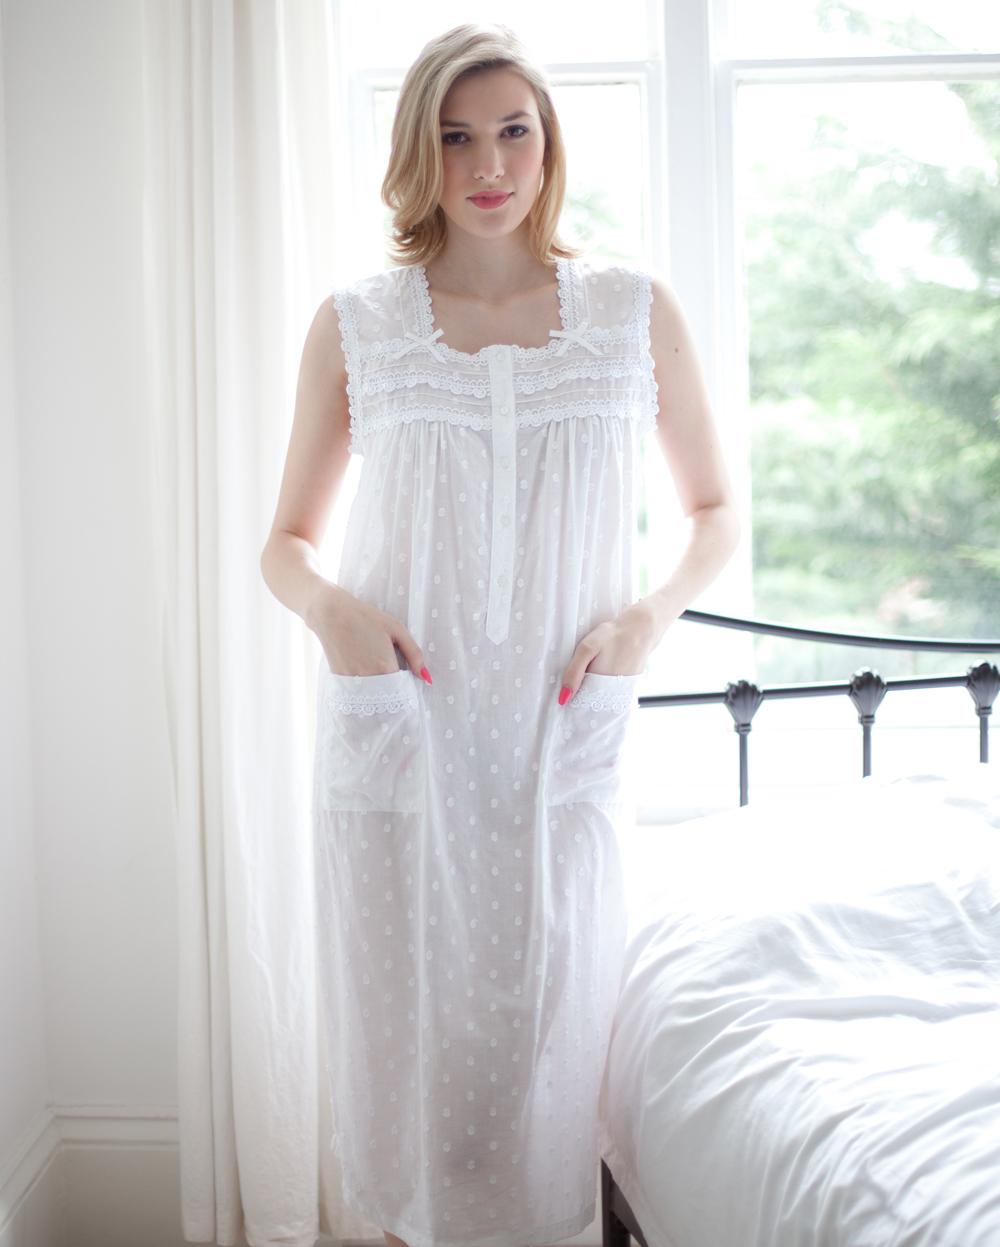 Janet Cotton Lawn Jaquard Polka Dot Sleeveless Nightdress - Cottonreal d1ba7ffc23